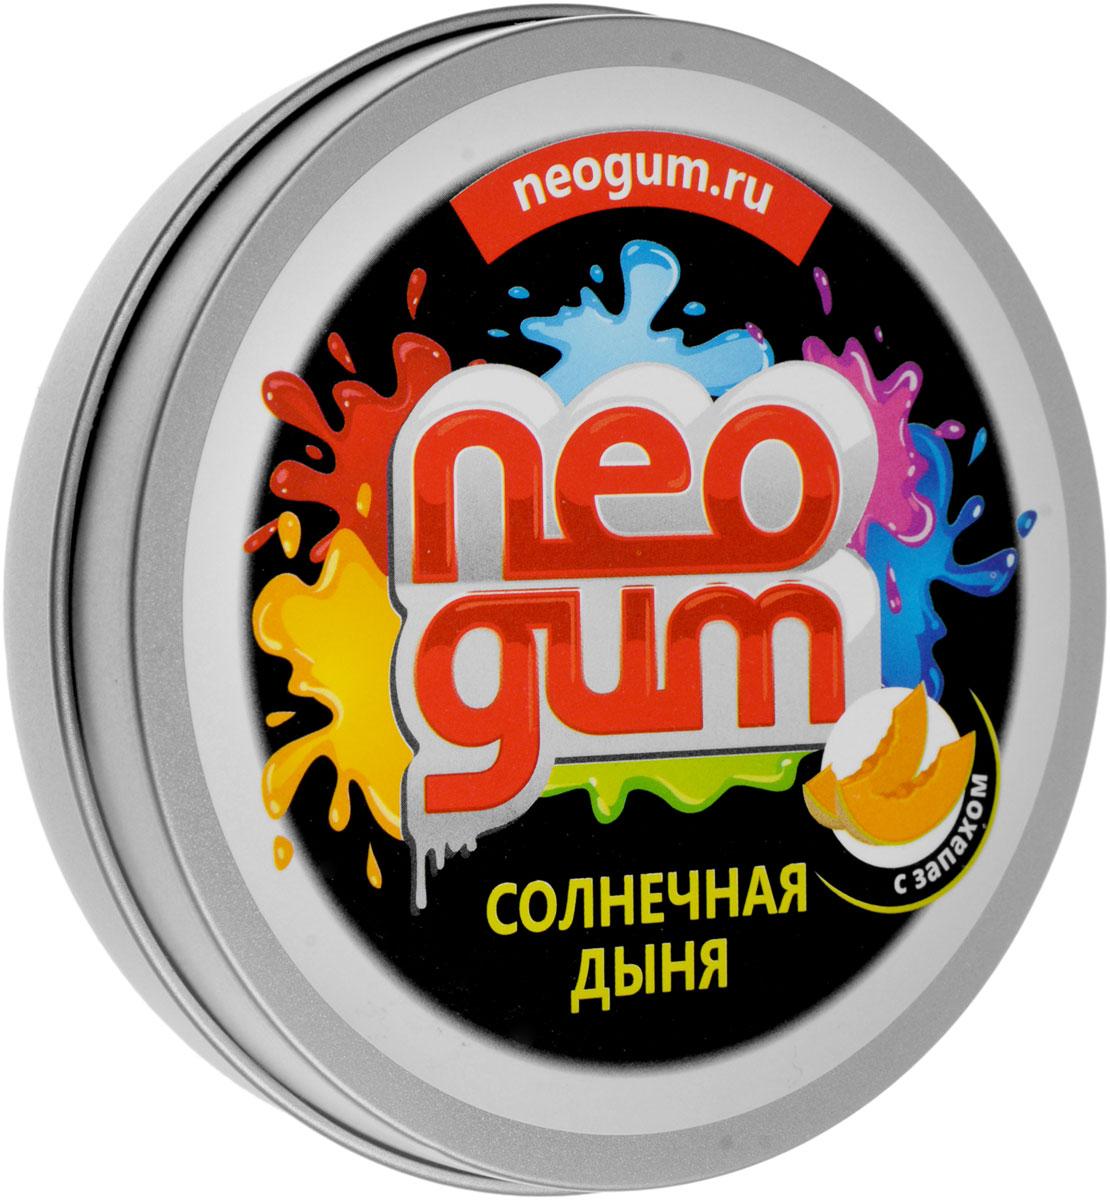 Neogum Жвачка для рук Солнечная дыня жвачка для рук меняющая цвет